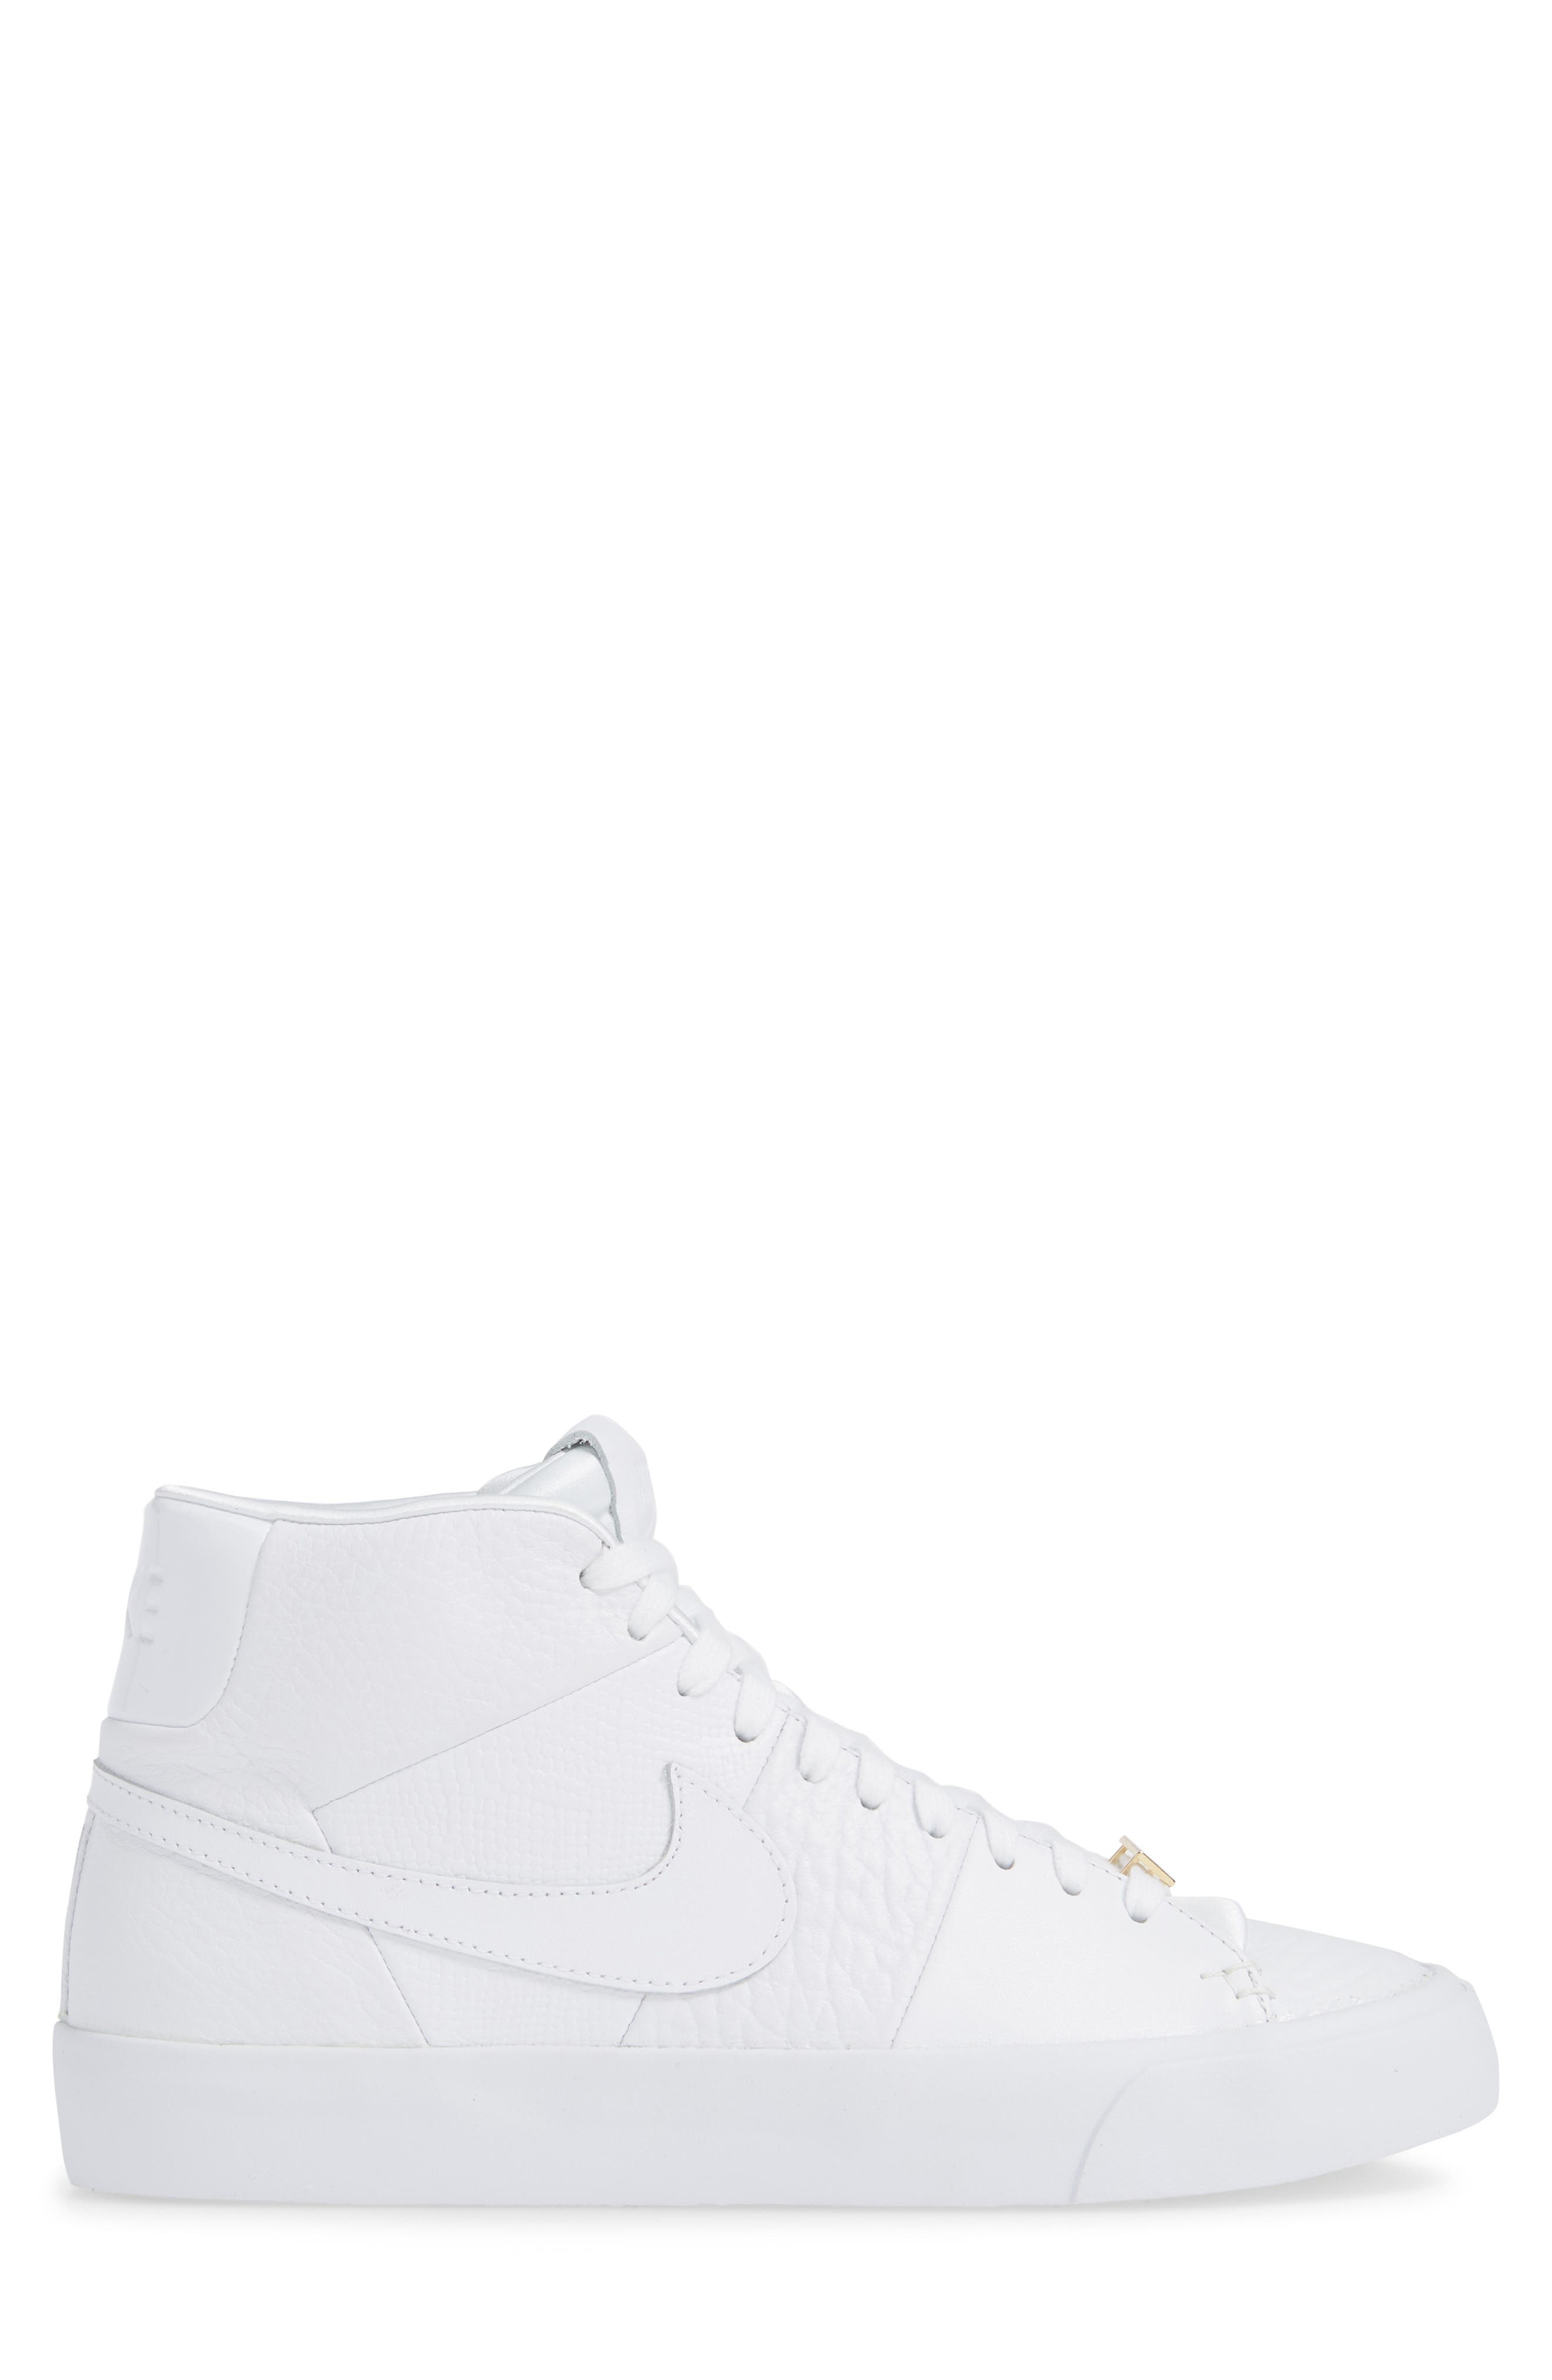 NIKE, Blazer Royal QS High Top Sneaker, Alternate thumbnail 3, color, 100